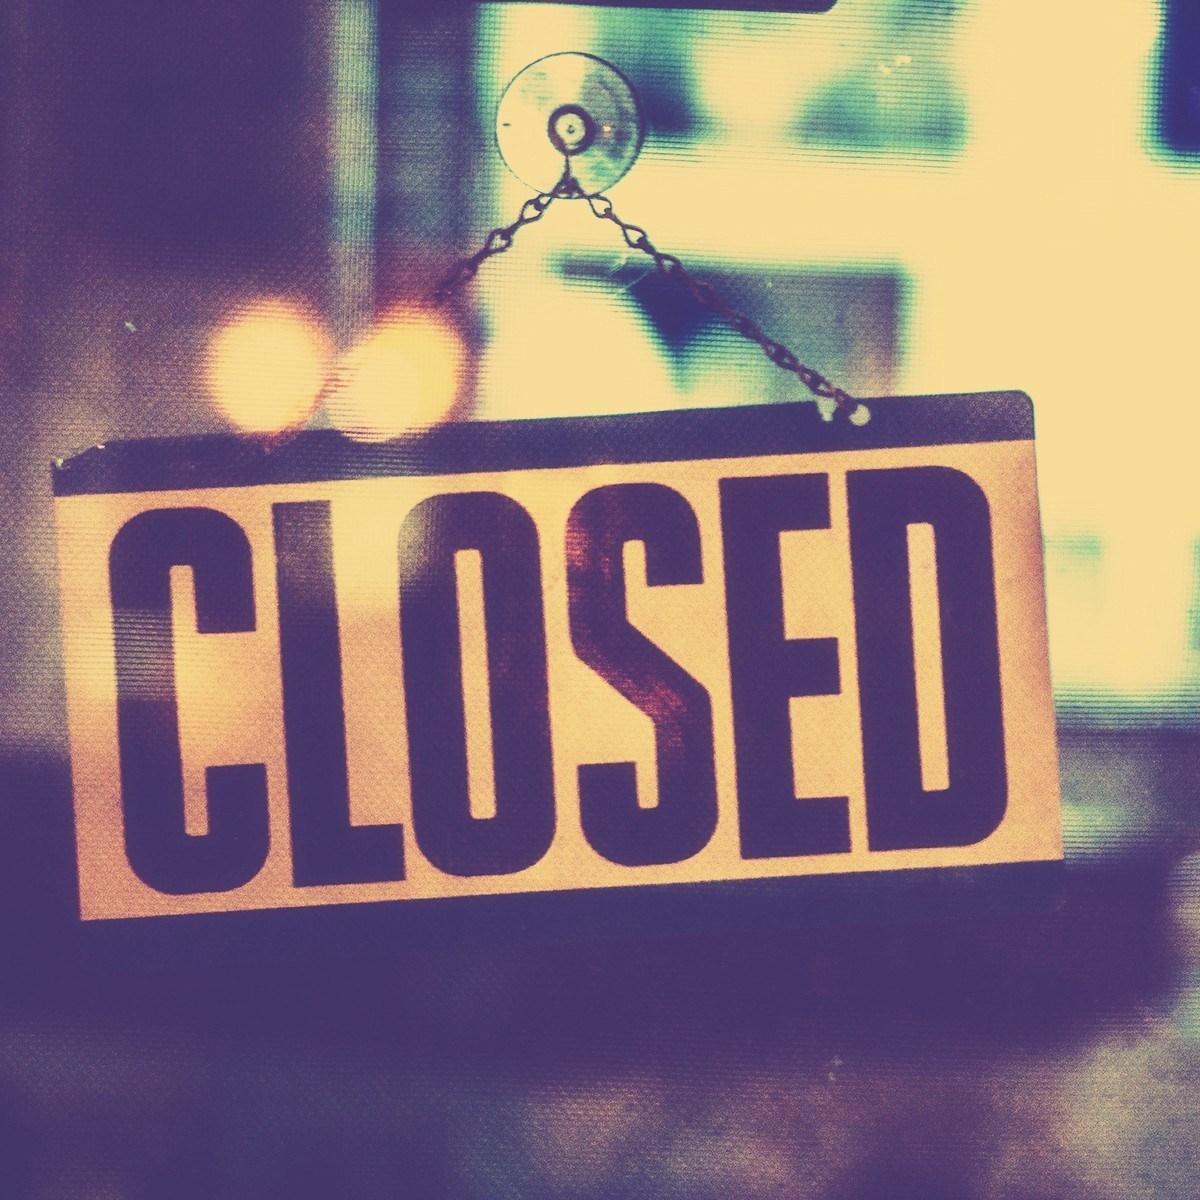 closed-sign-hd-wallpaper.jpg